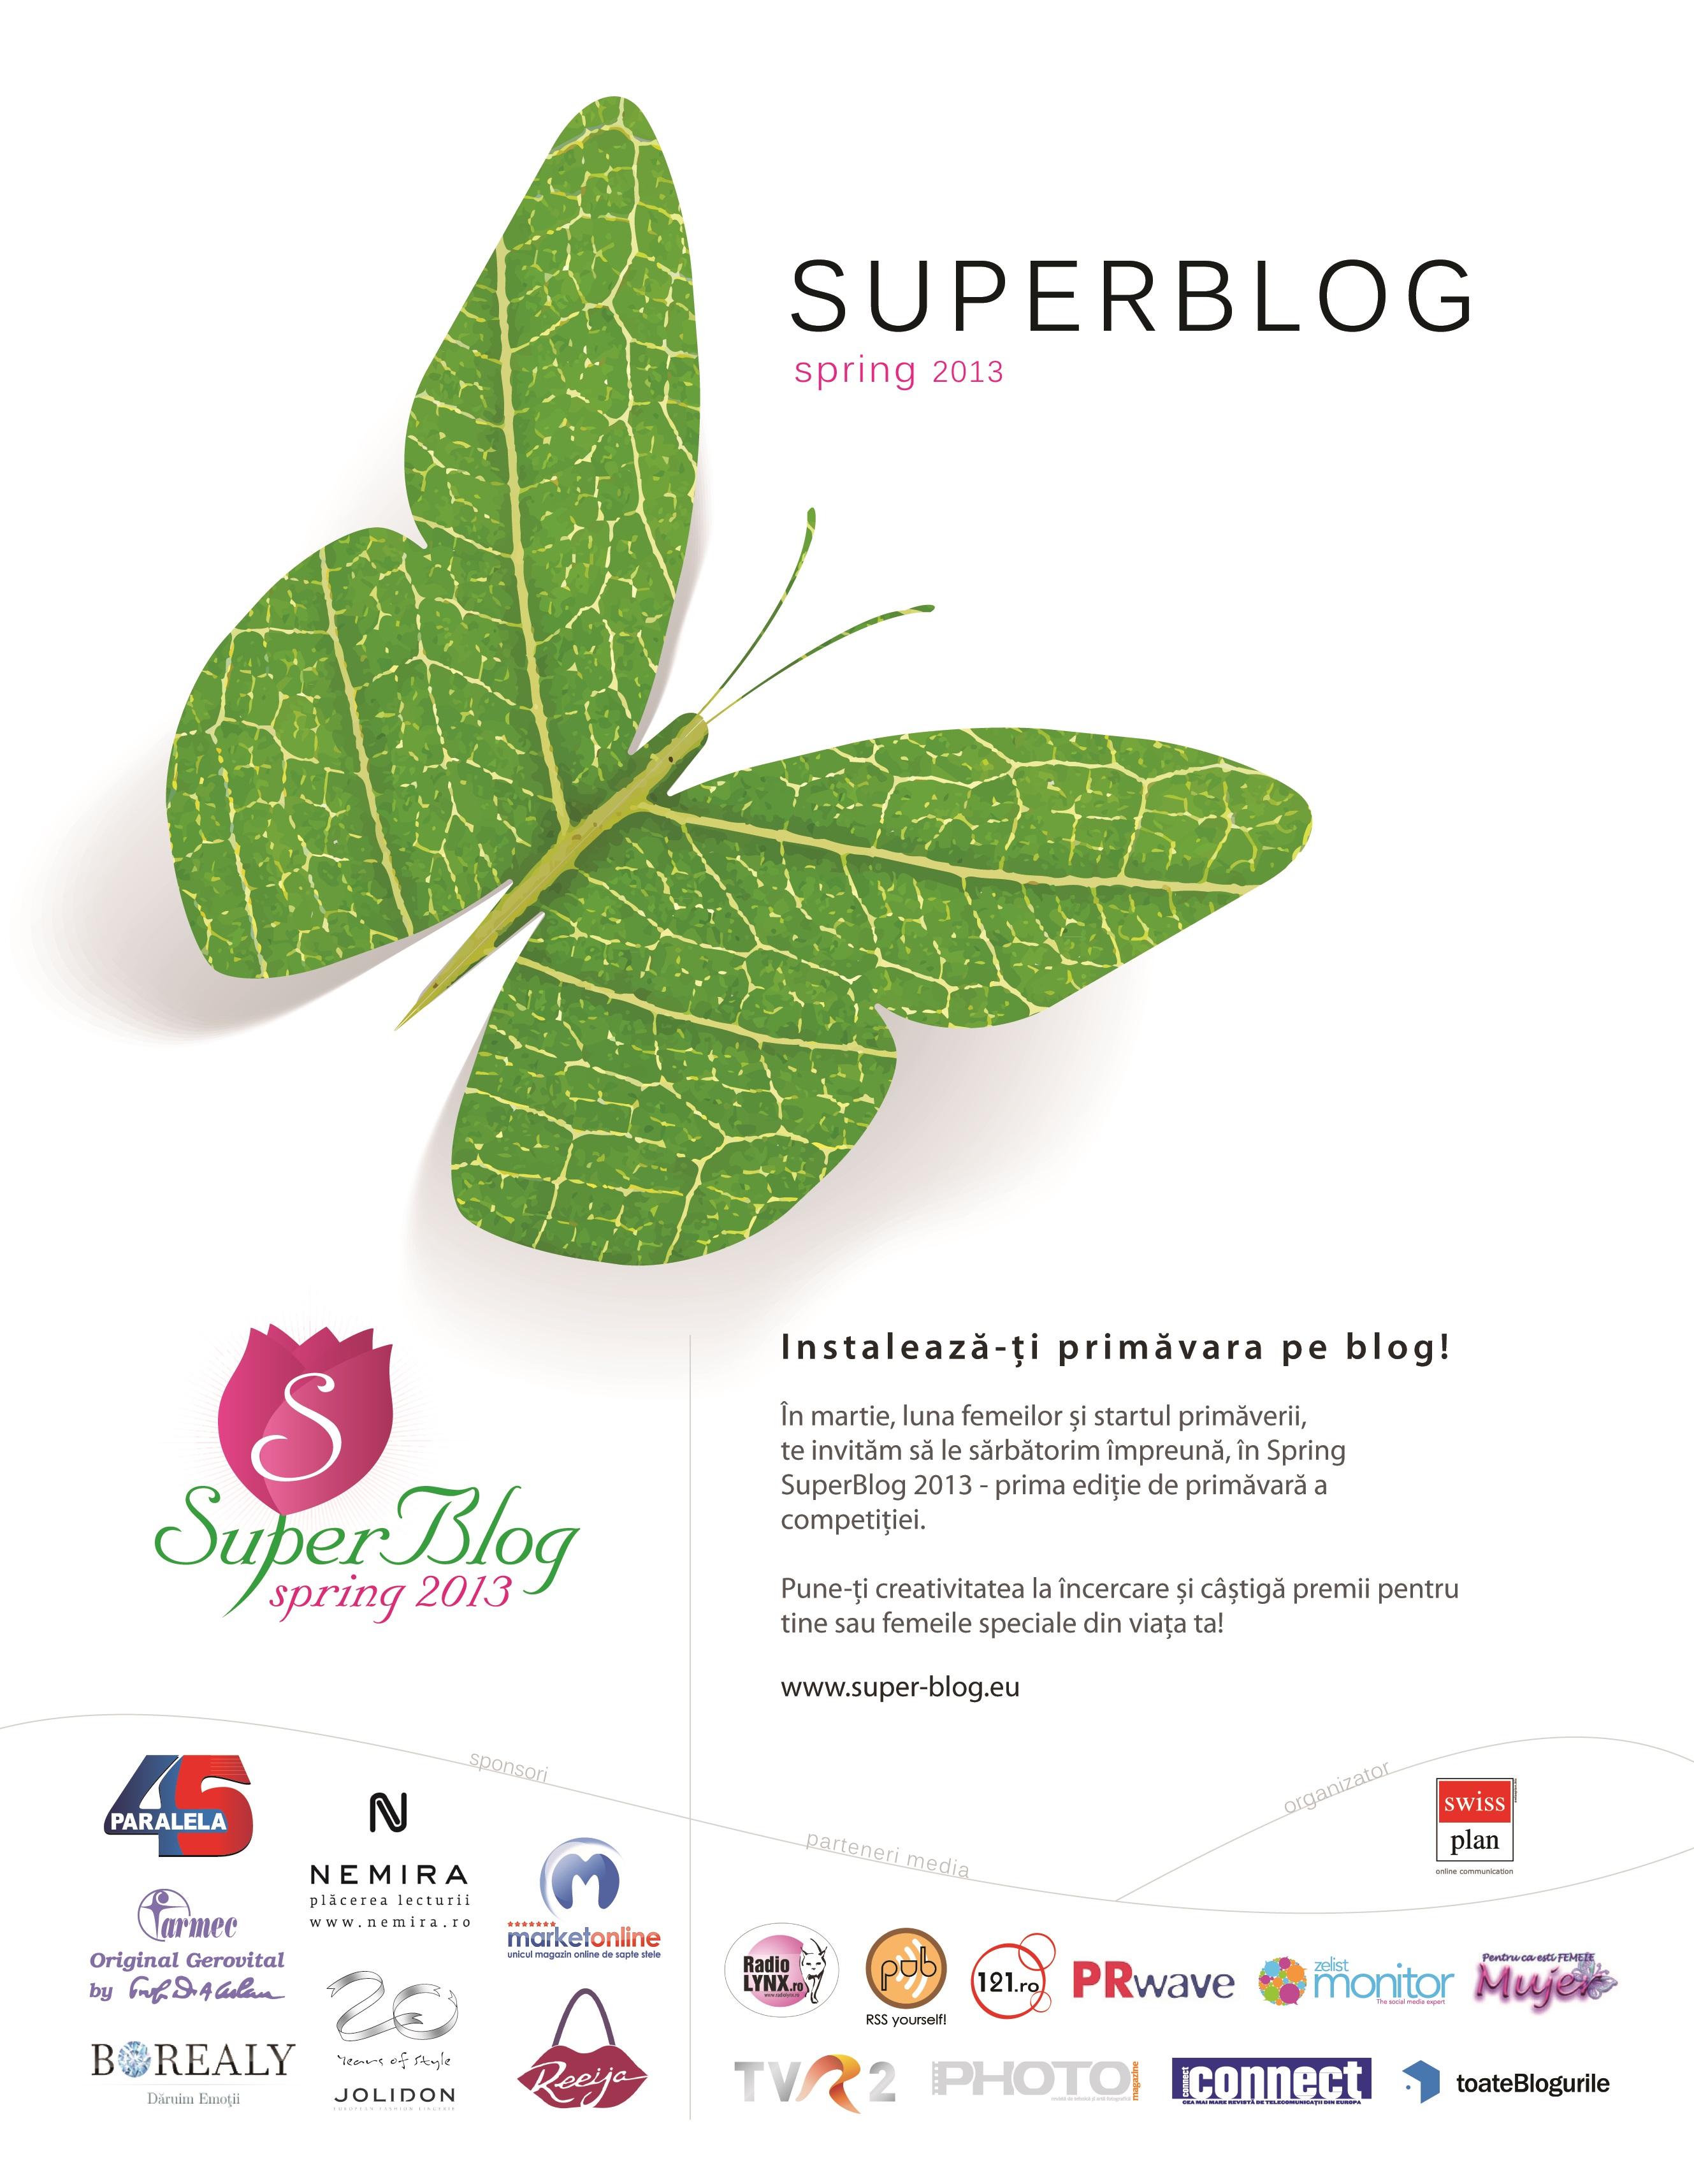 superblog spring 2013 v2 cs5